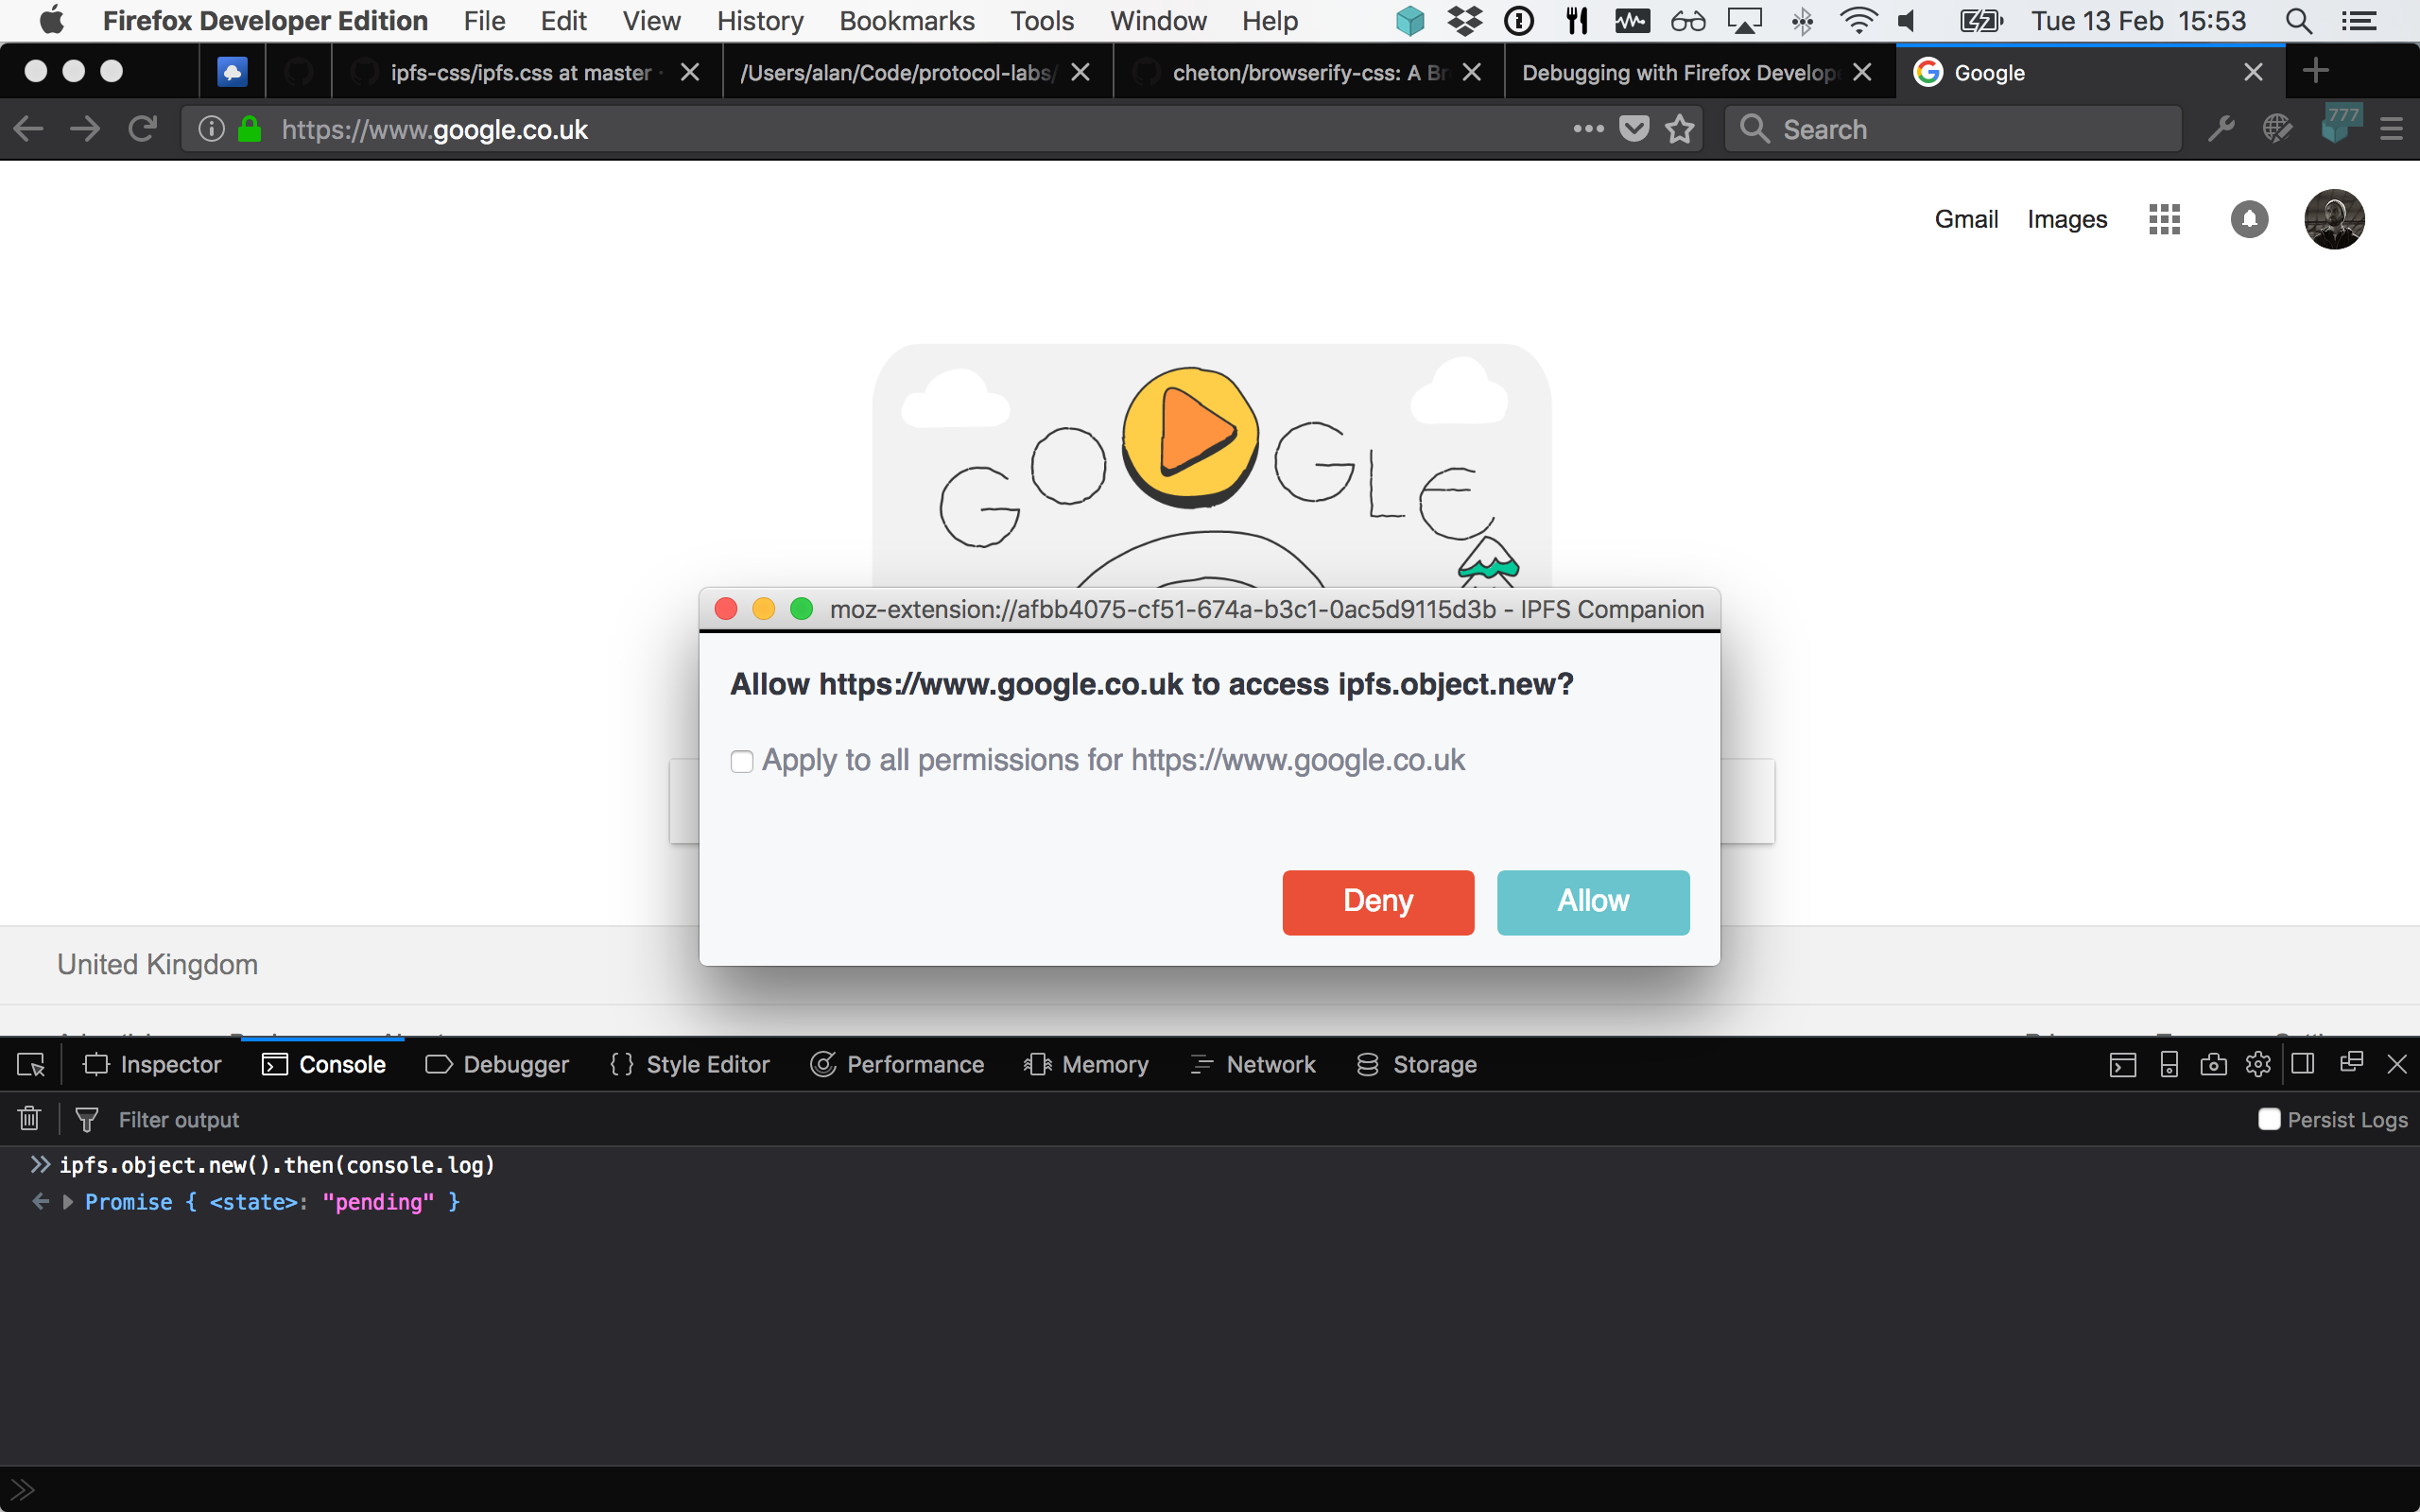 permission dialog in Firefox